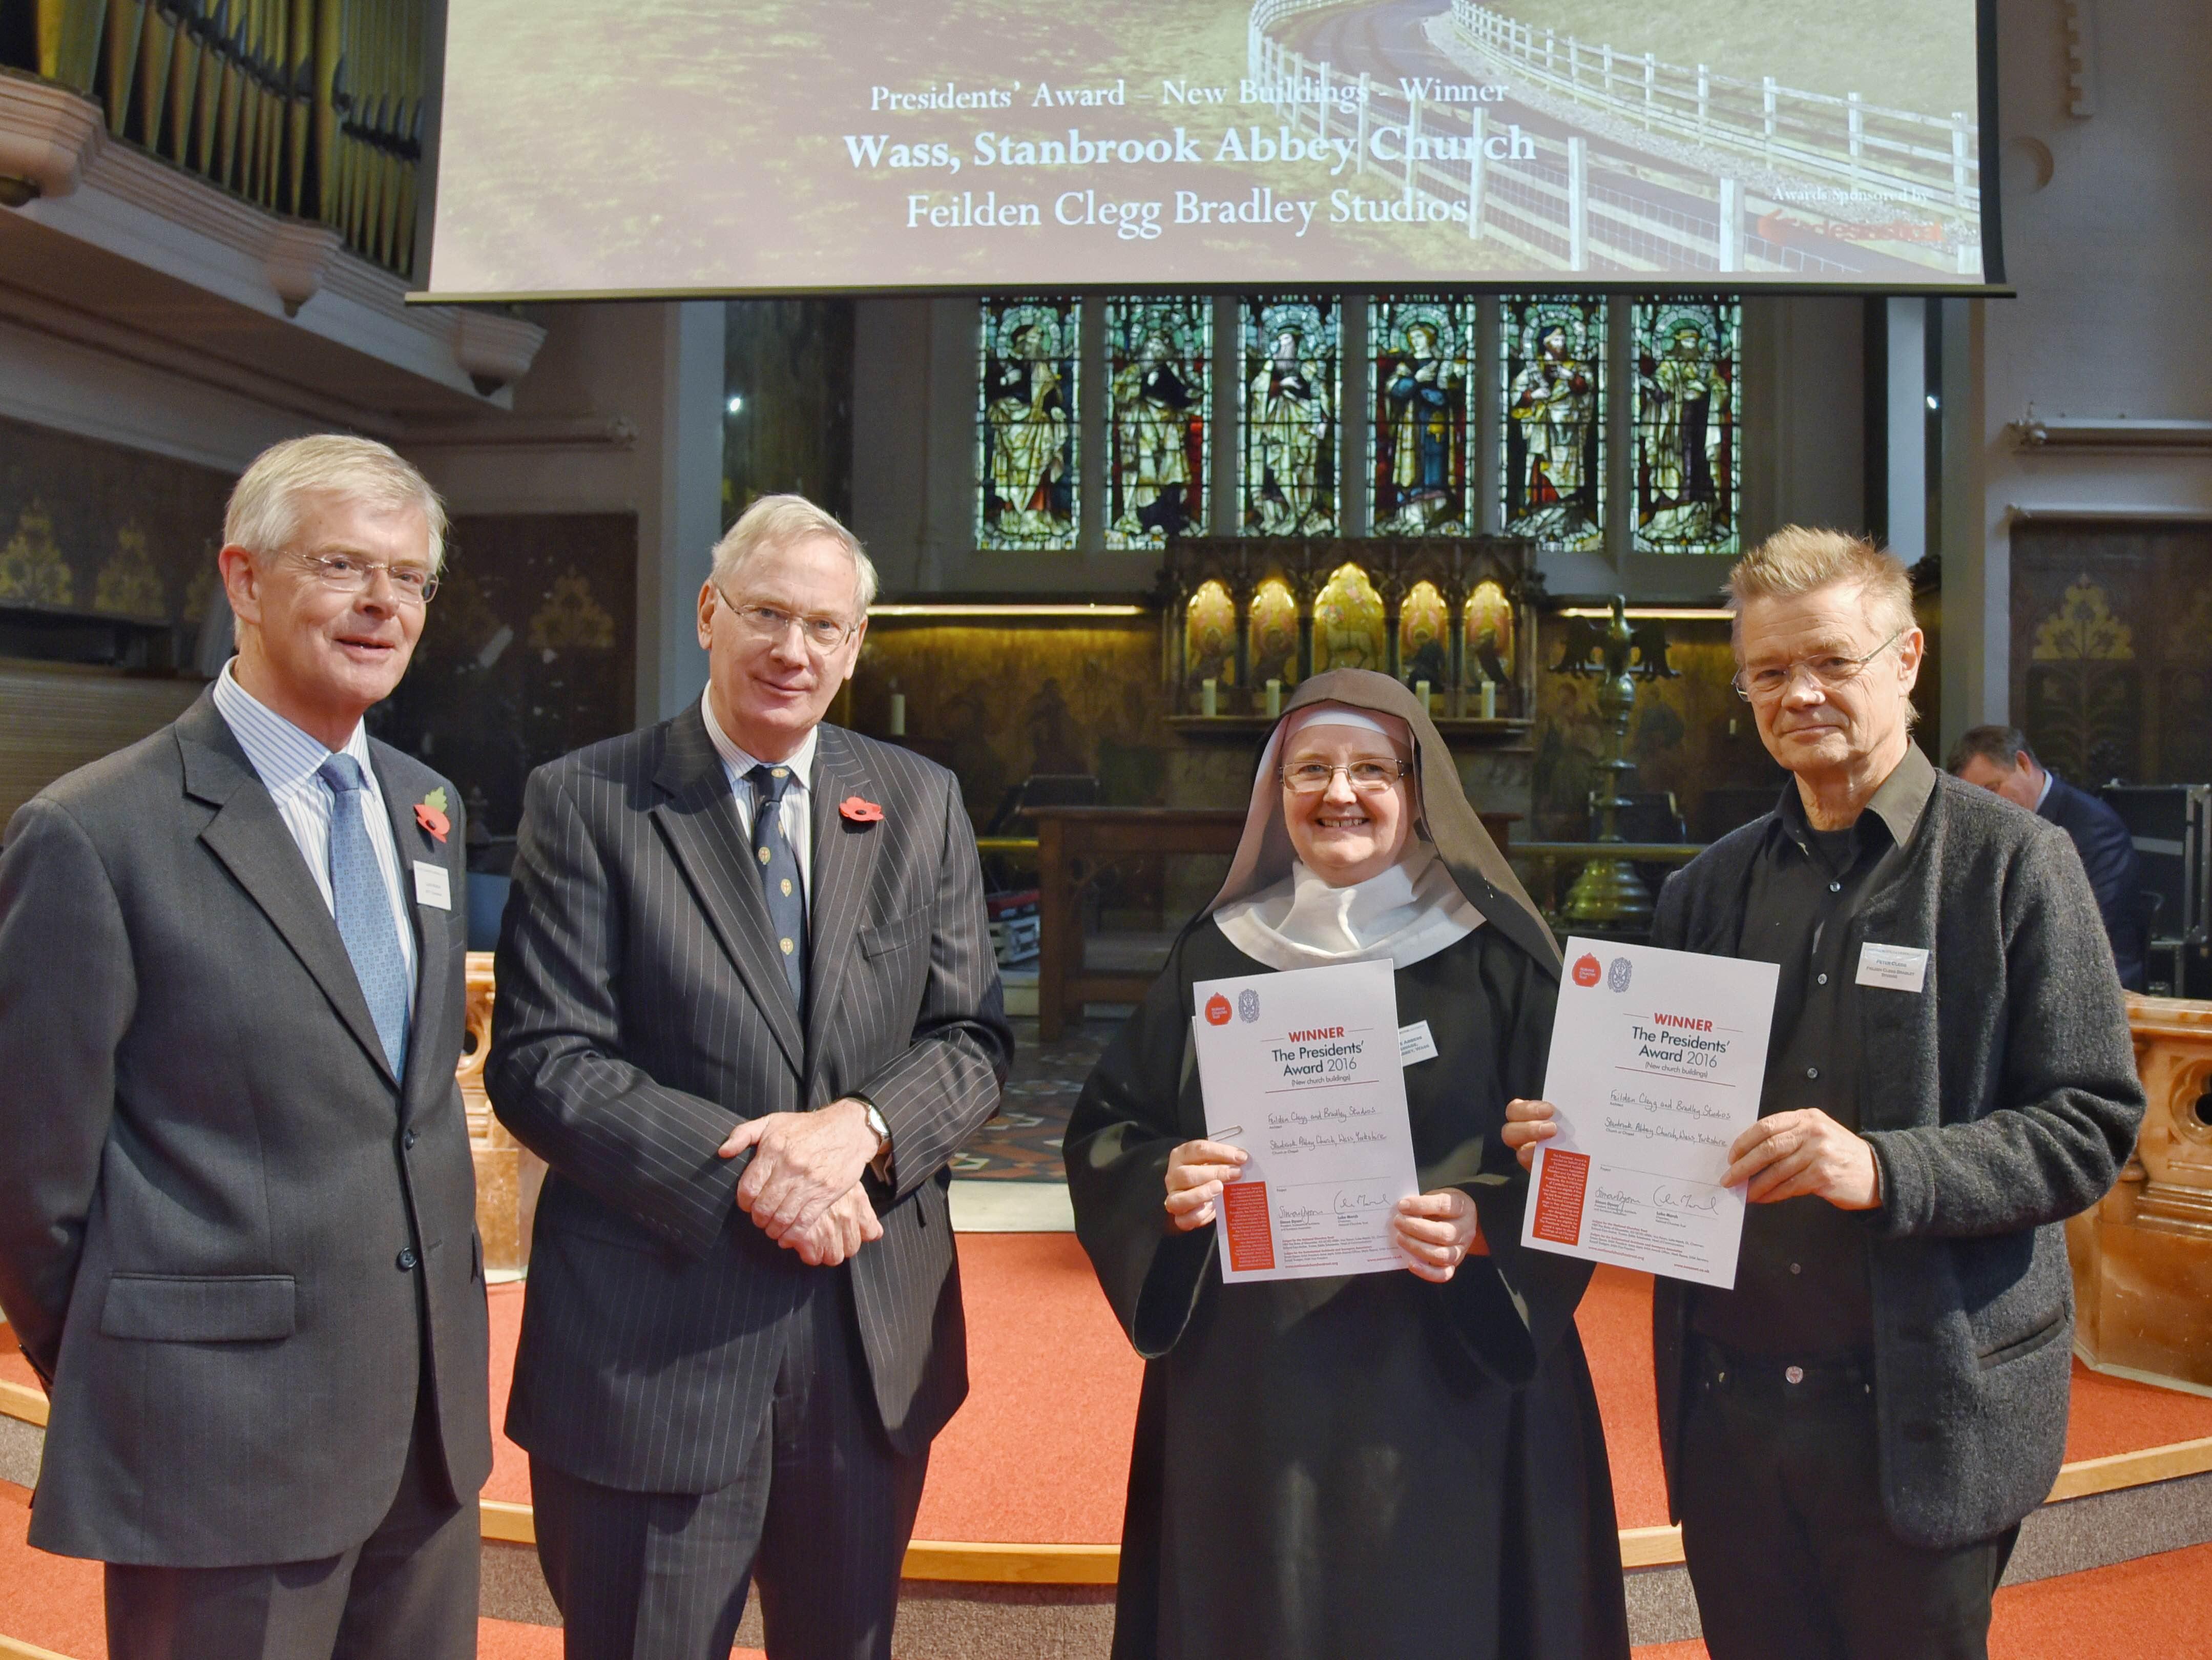 Winner of the 2016 Presidents' Award for new church buildings